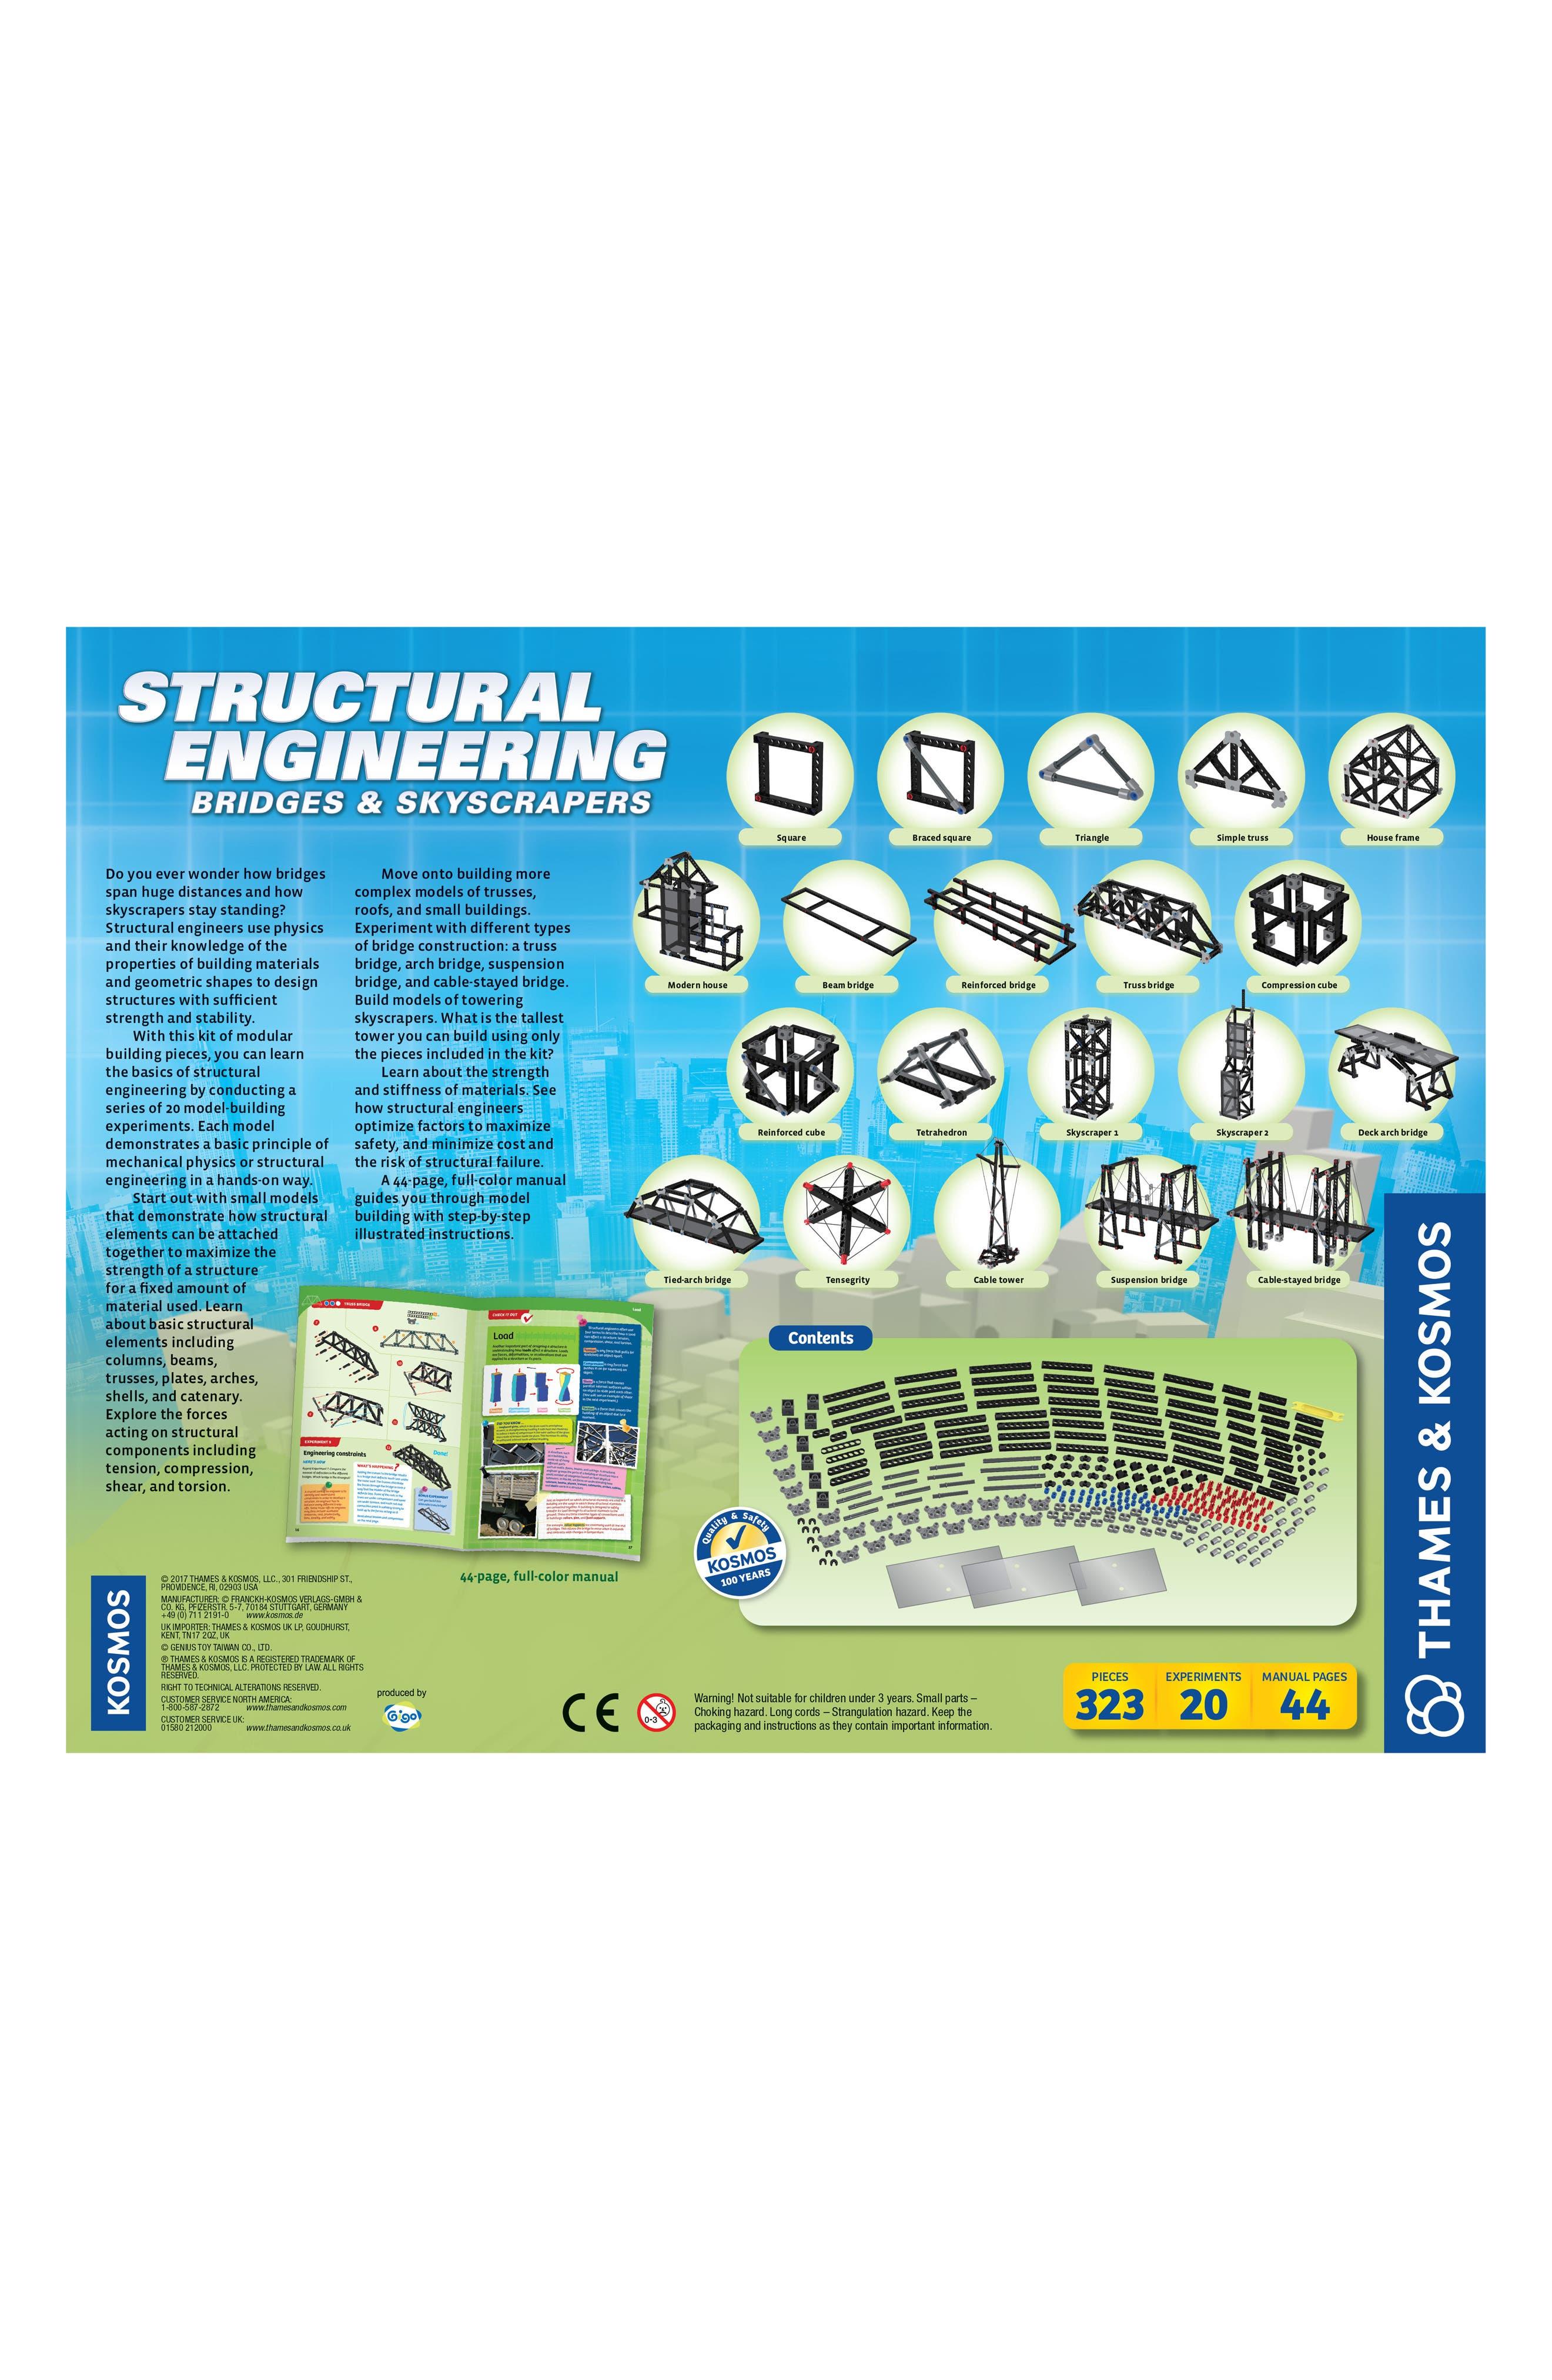 Structural Engineering 323-Piece Bridges & Skyscrapers Building Kit,                             Alternate thumbnail 2, color,                             001